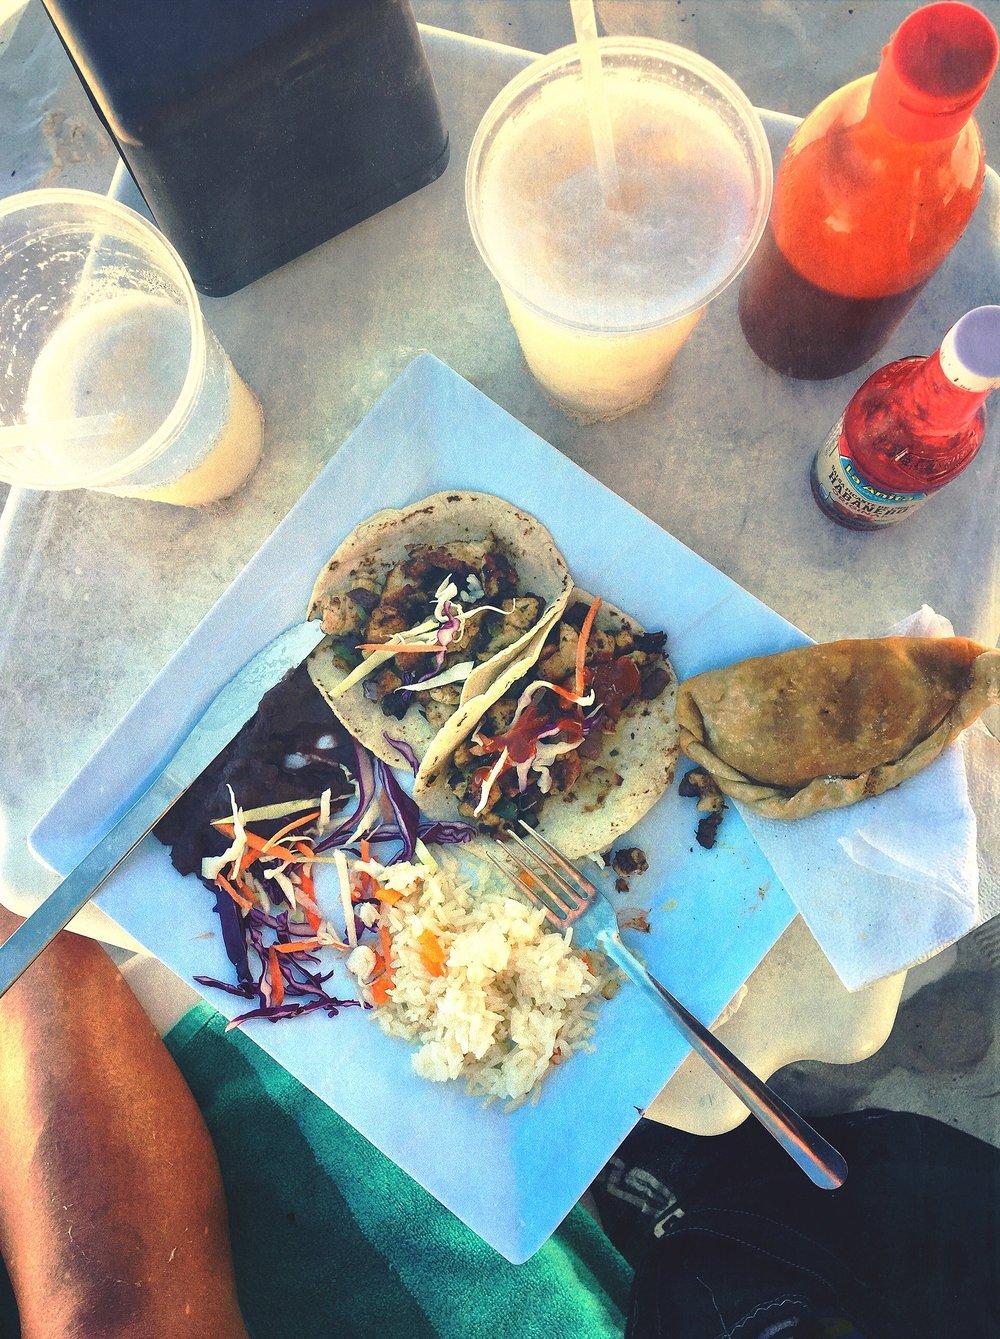 Tacos, Rice + Beans @ Playa Santa Fe